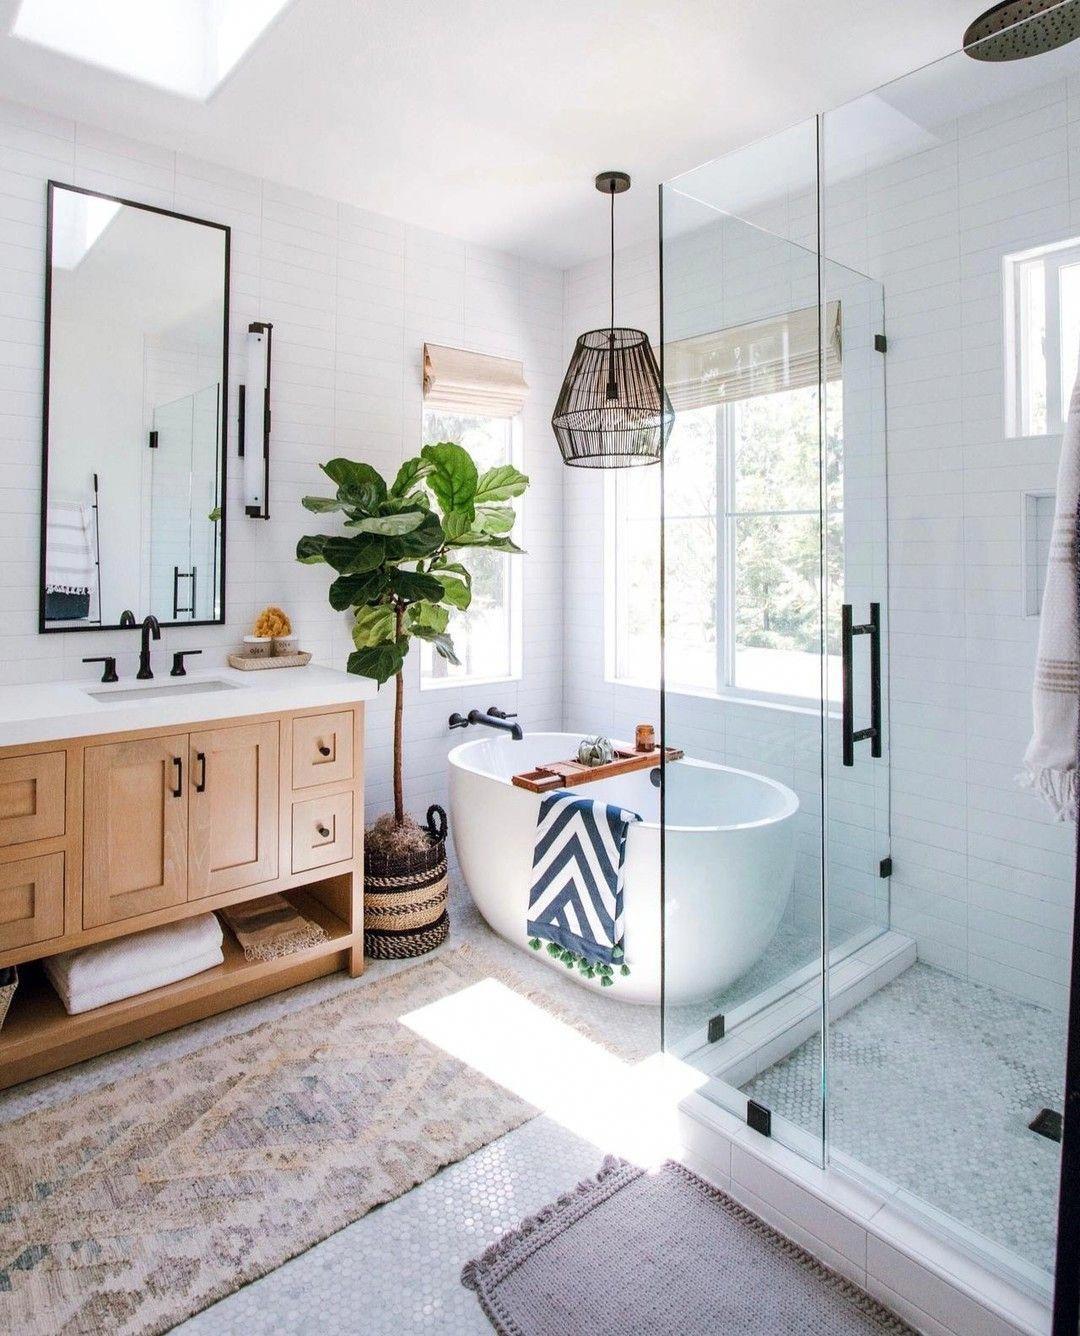 Bathroom Rug Idea Bathroom Rug Ideas House Bathroom Bathroom Interior Design Bathrooms Remodel [ 1336 x 1080 Pixel ]